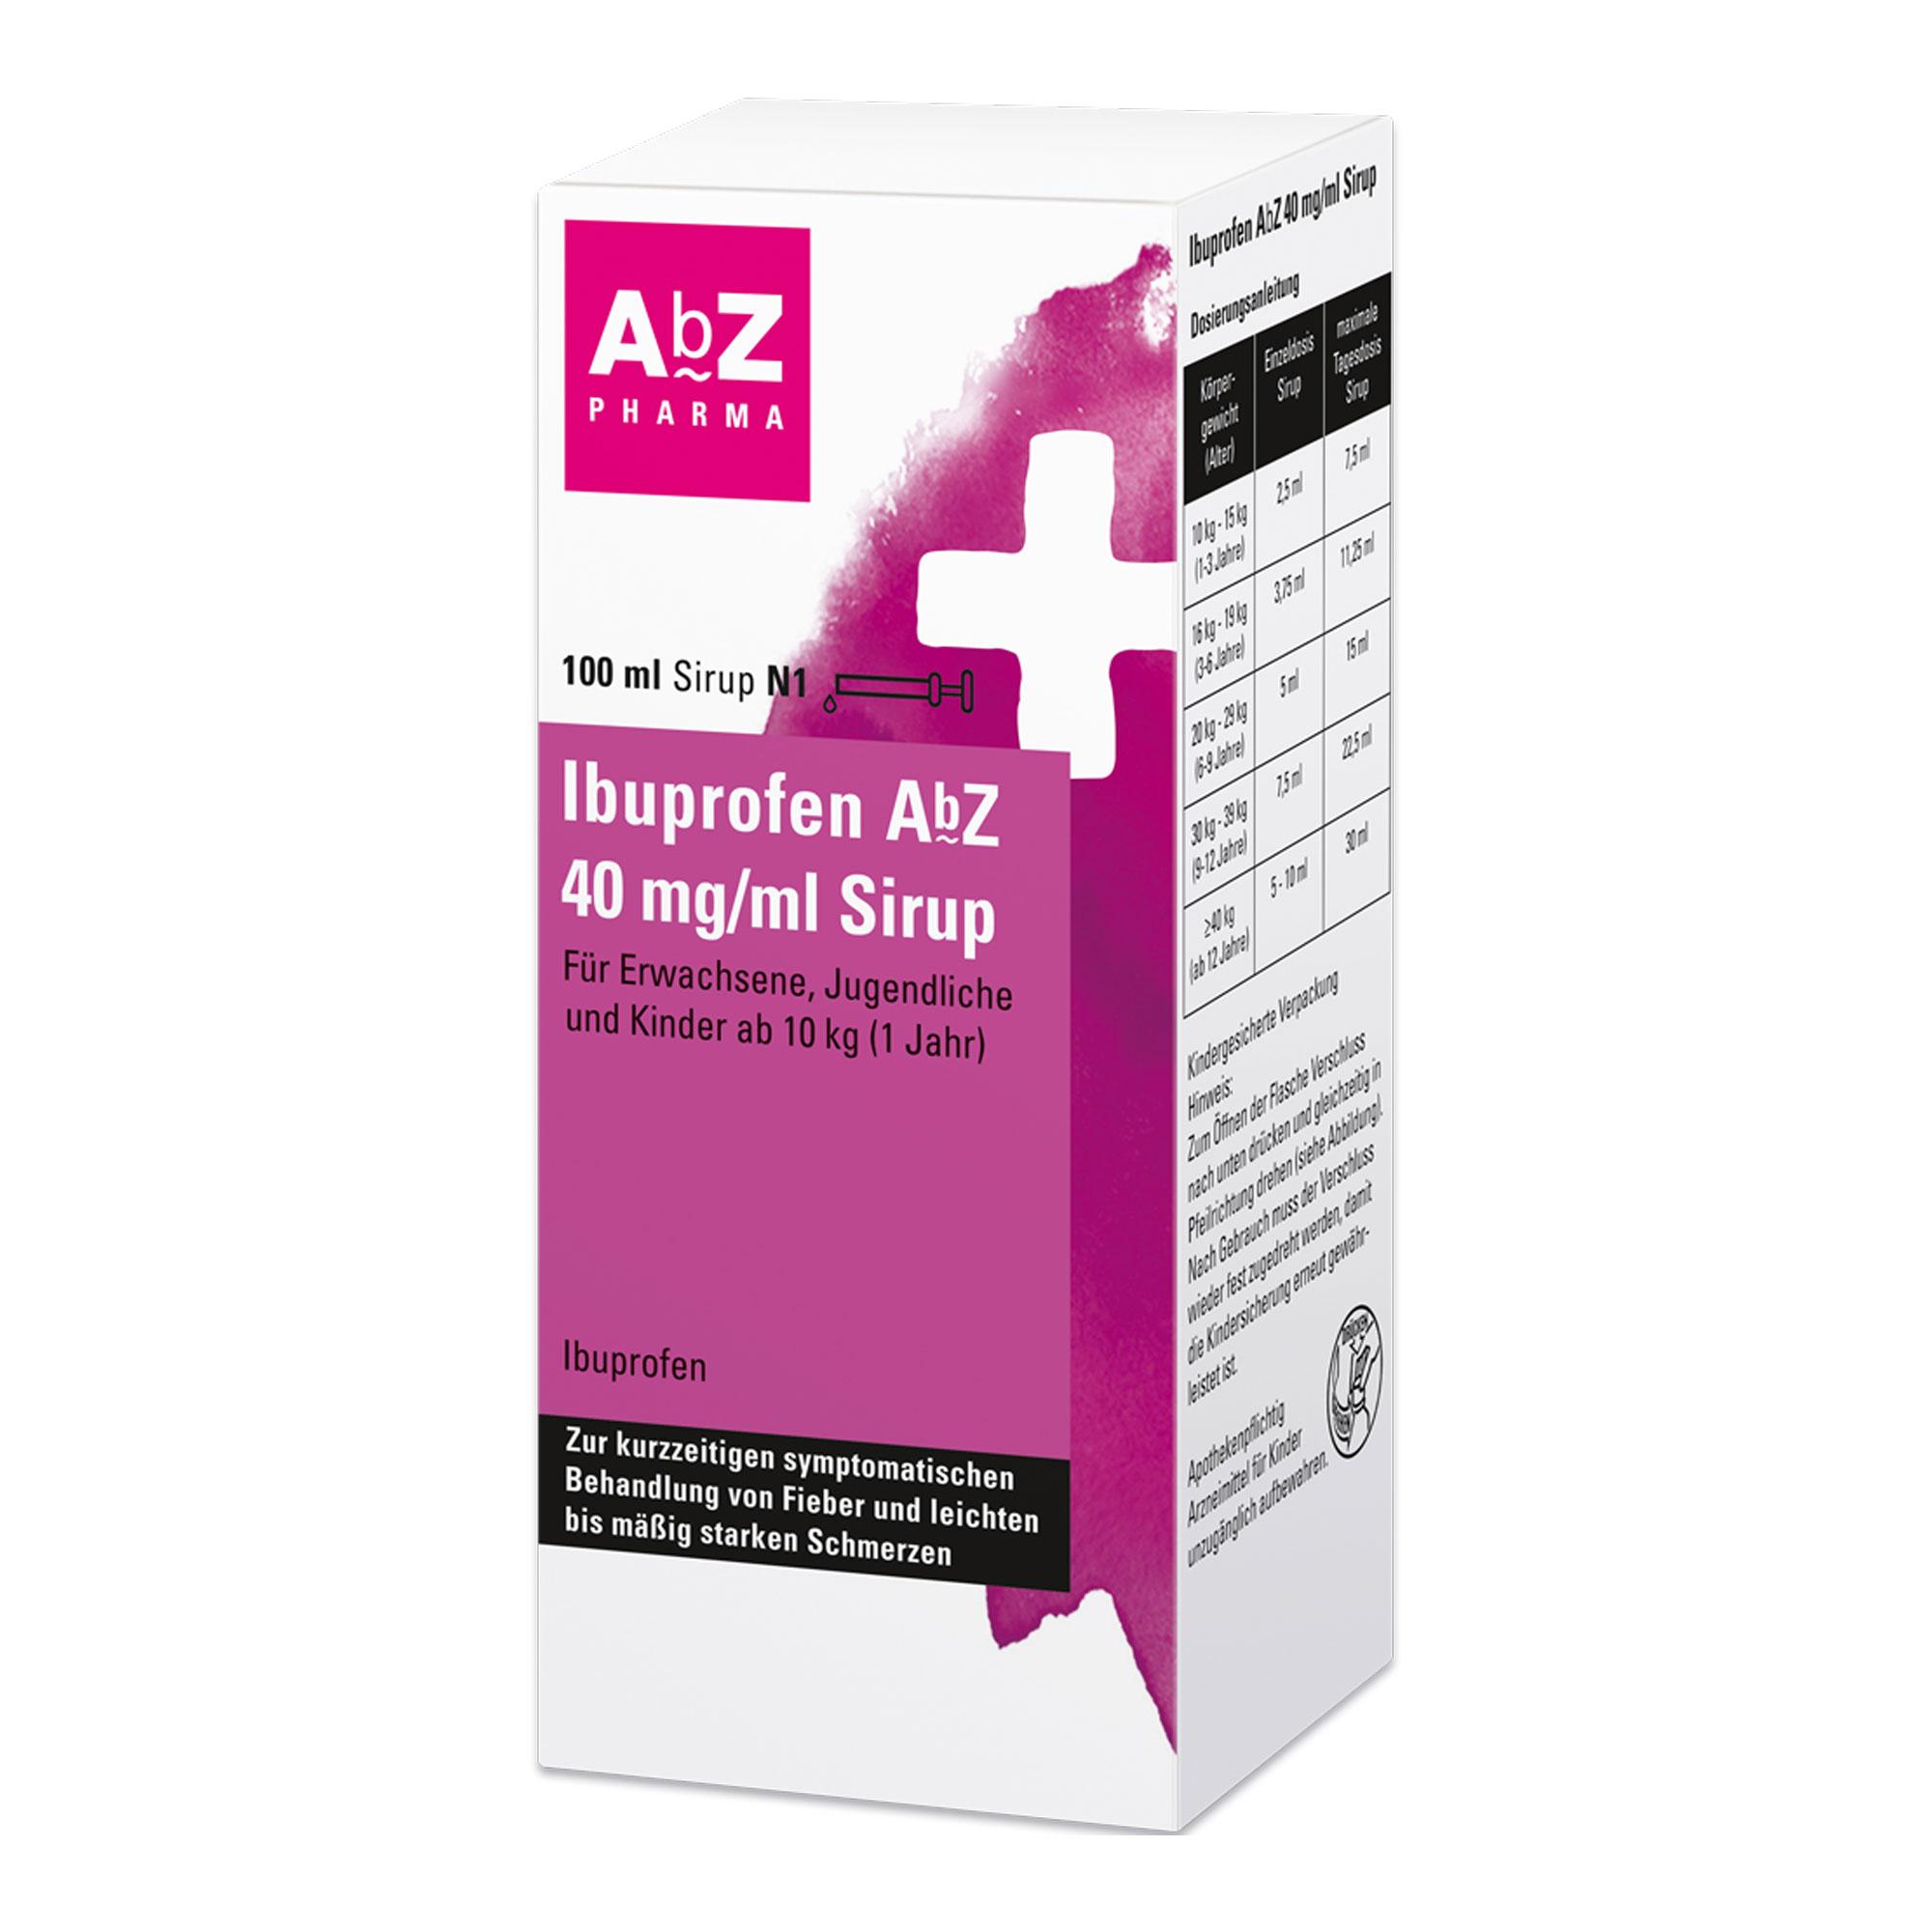 Ibuprofen AbZ 40 mg/ml Sirup für Kinder ab 10kg